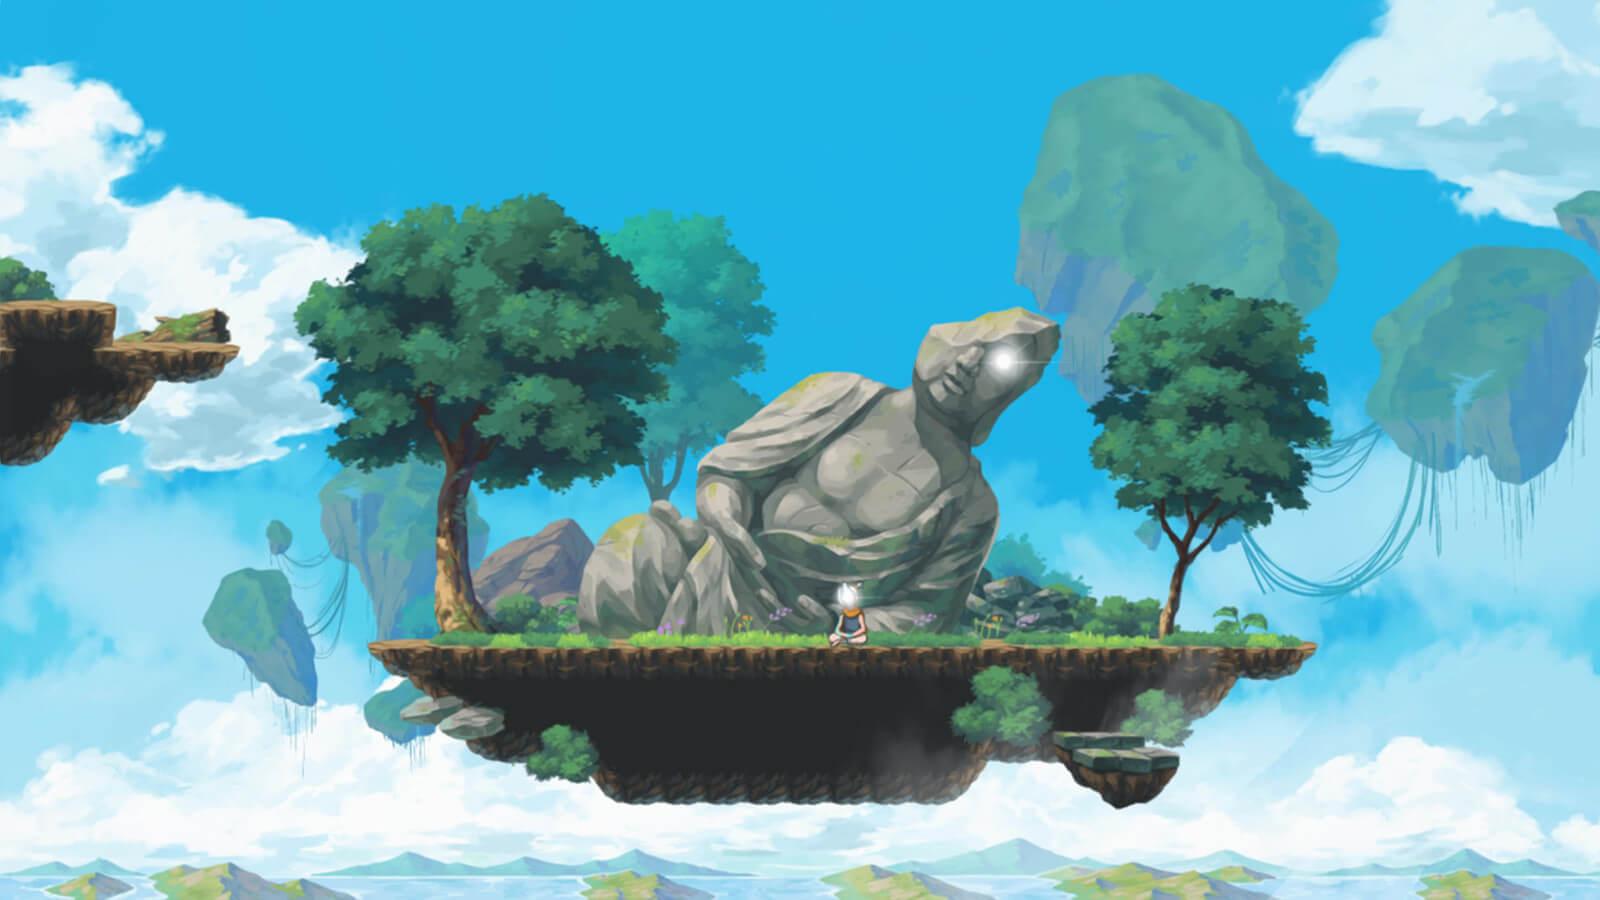 Broken statue on a floating island